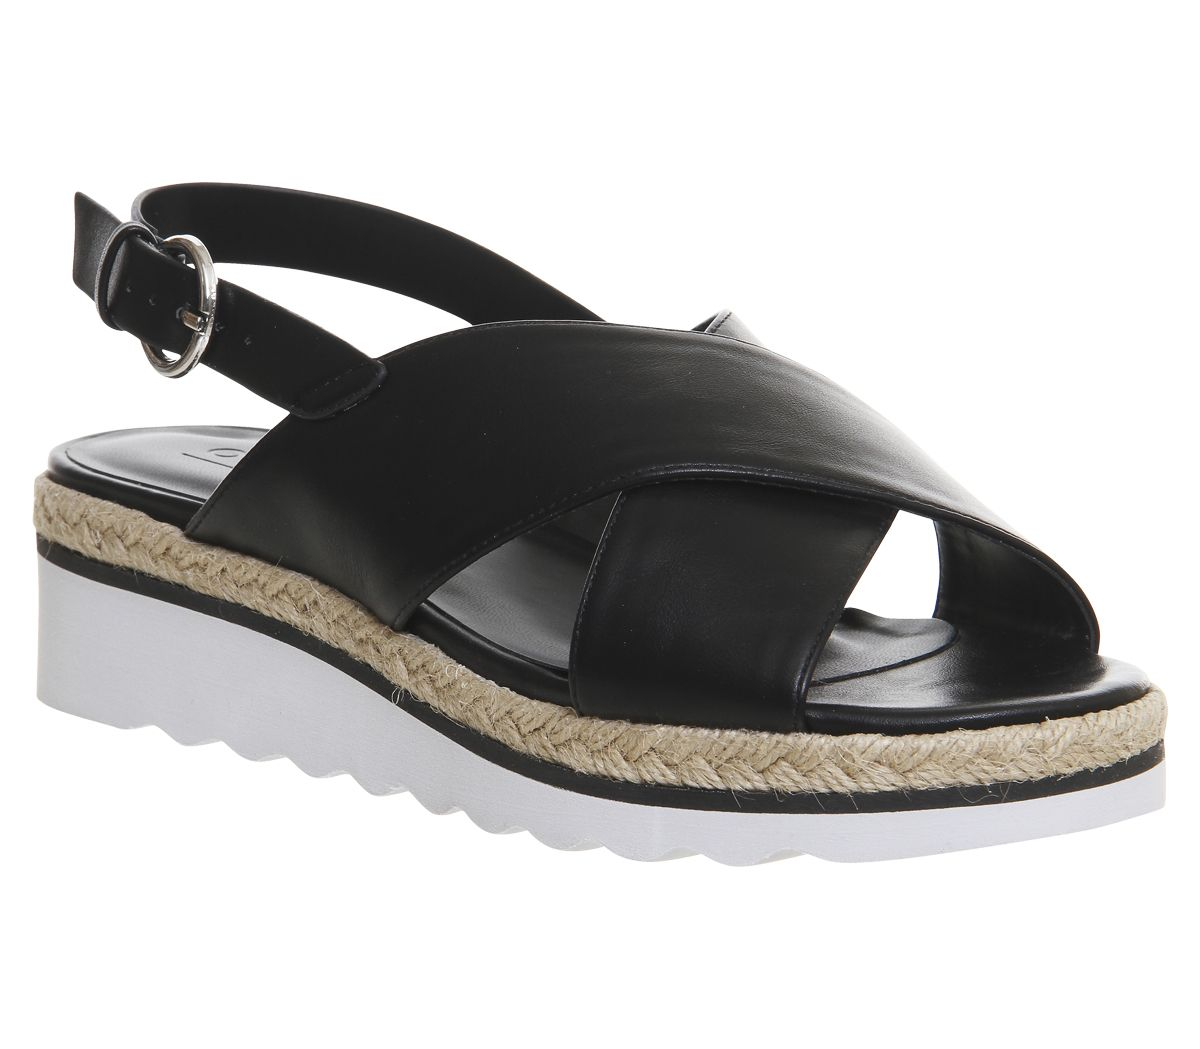 15f01a9b025 Office Saturn Cross Strap Espadrille Sandals Black - Sandals